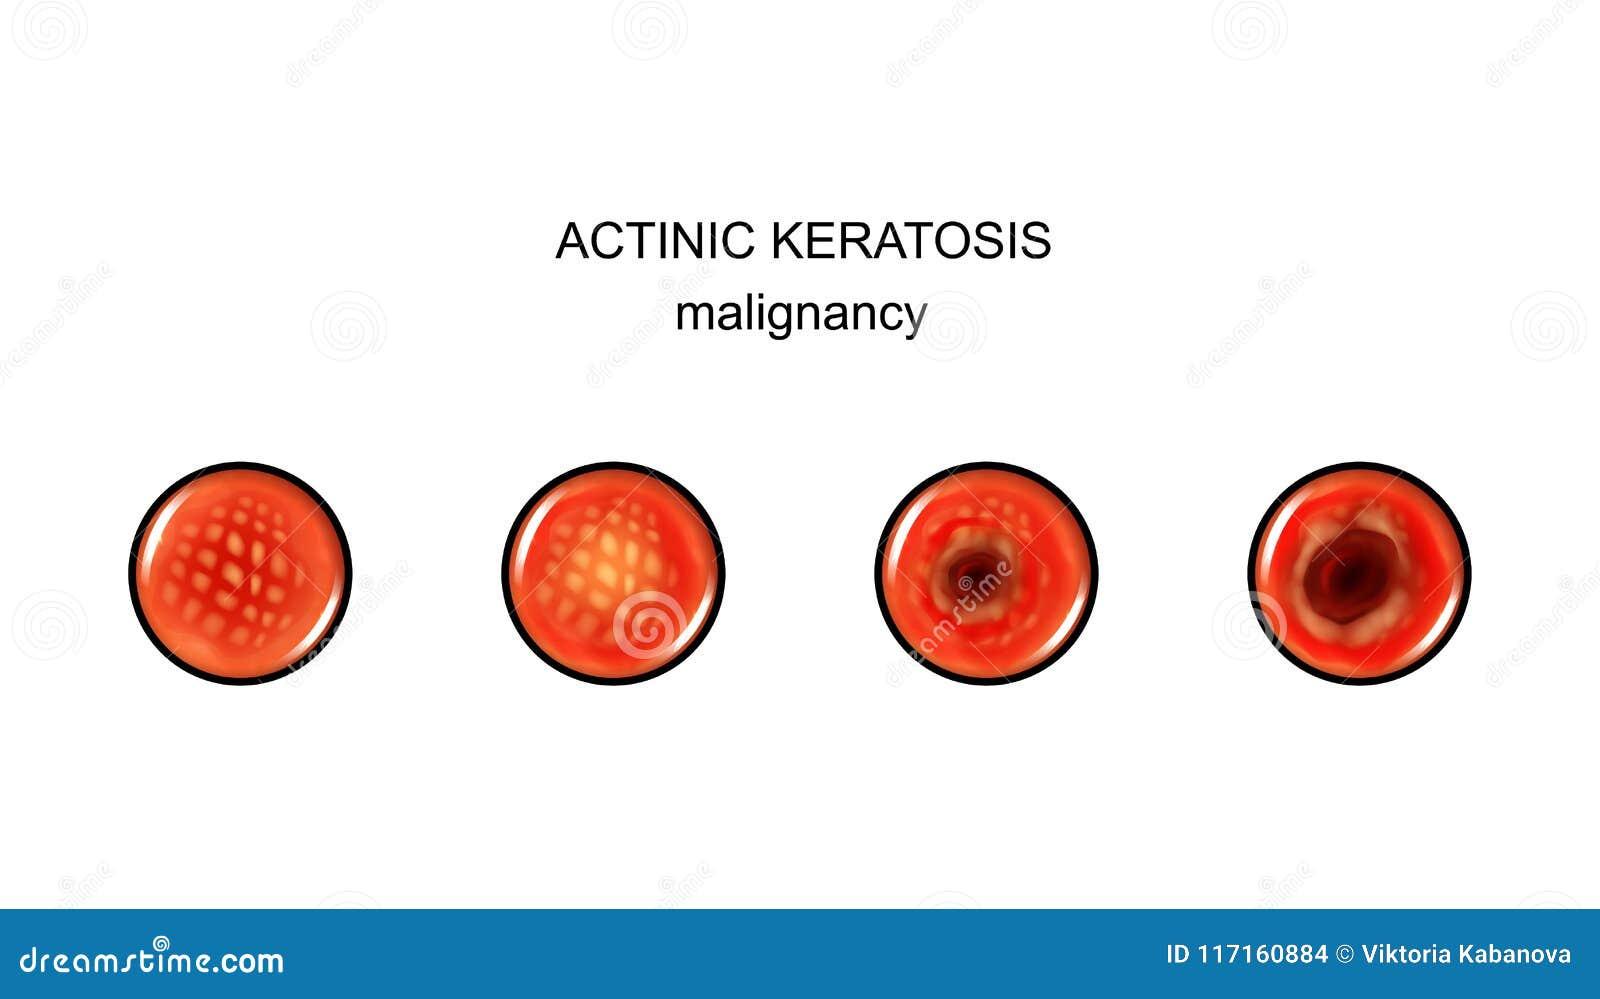 vermox vs helmintox